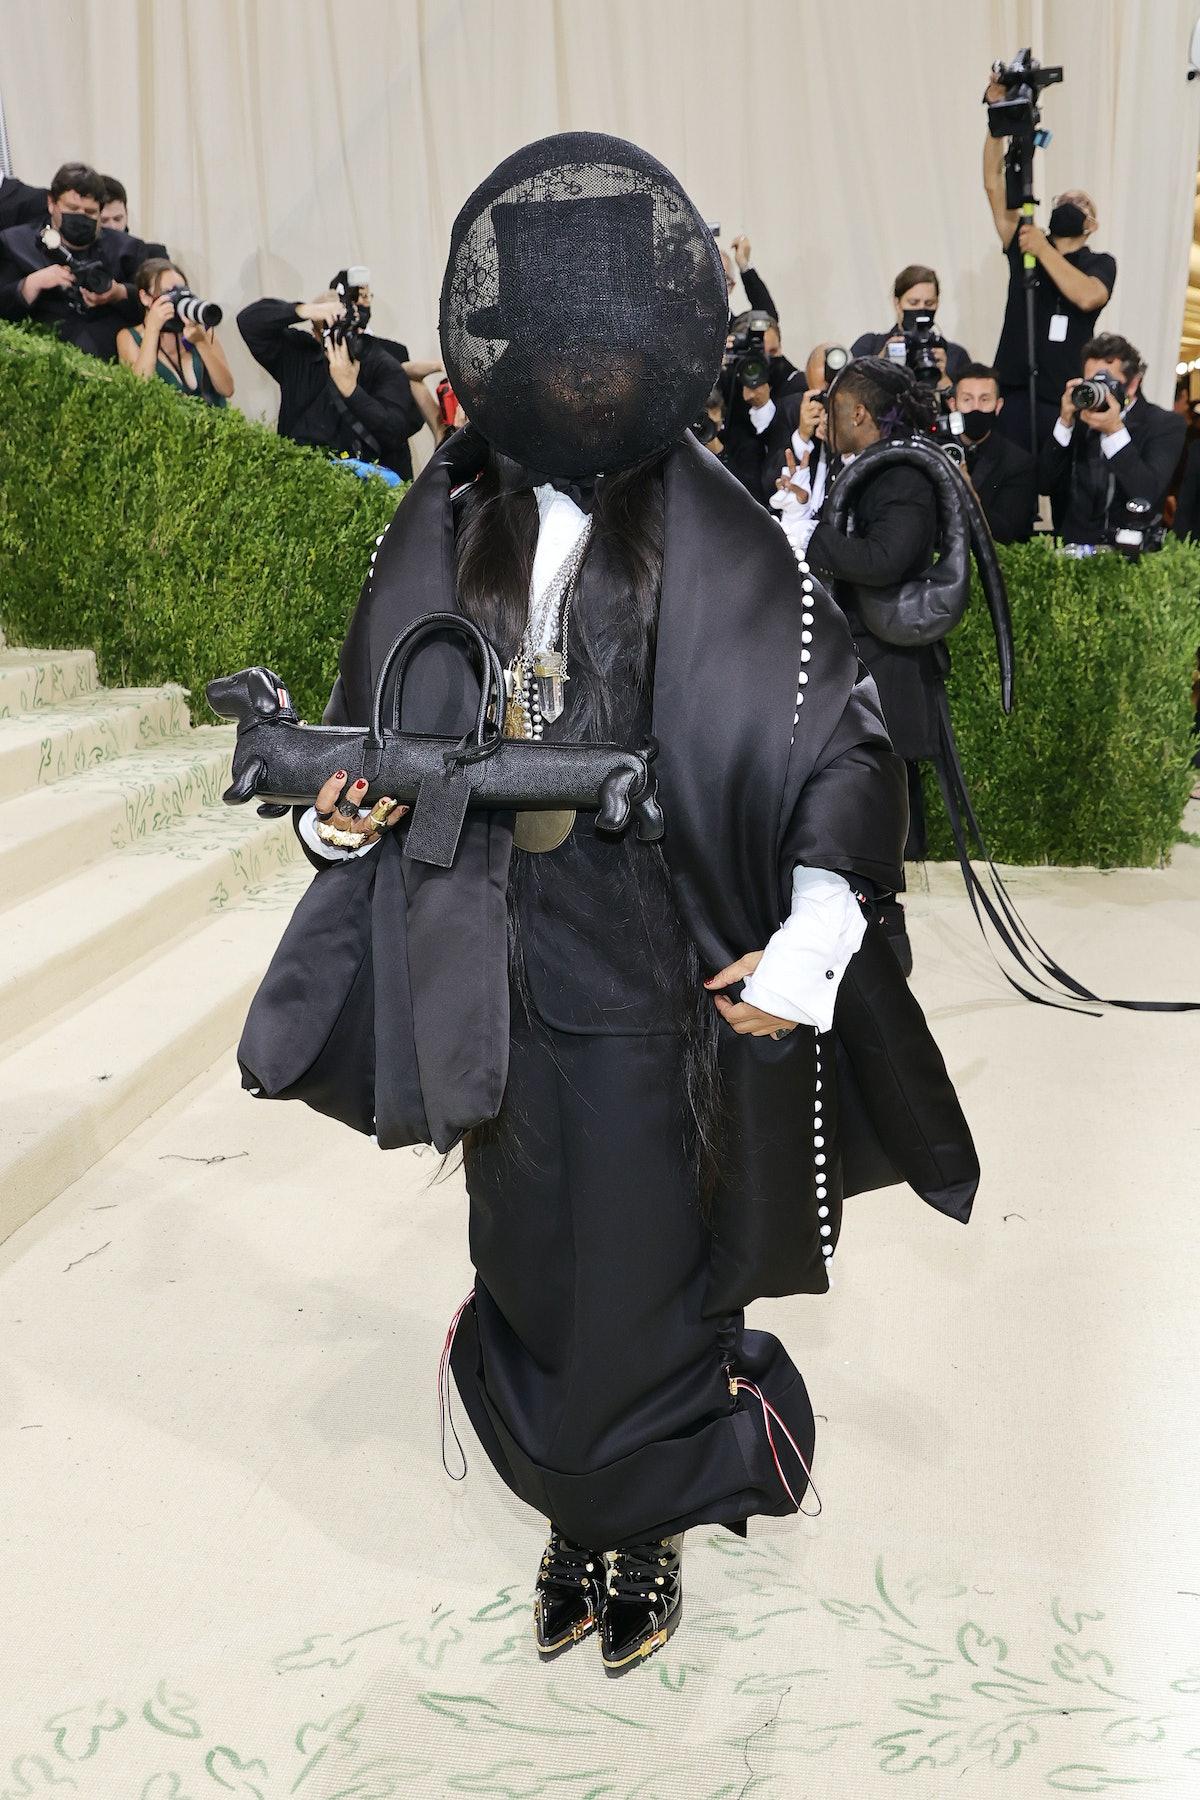 Erykah Badu attends The 2021 Met Gala Celebrating In America: A Lexicon Of Fashion at Metropolitan M...